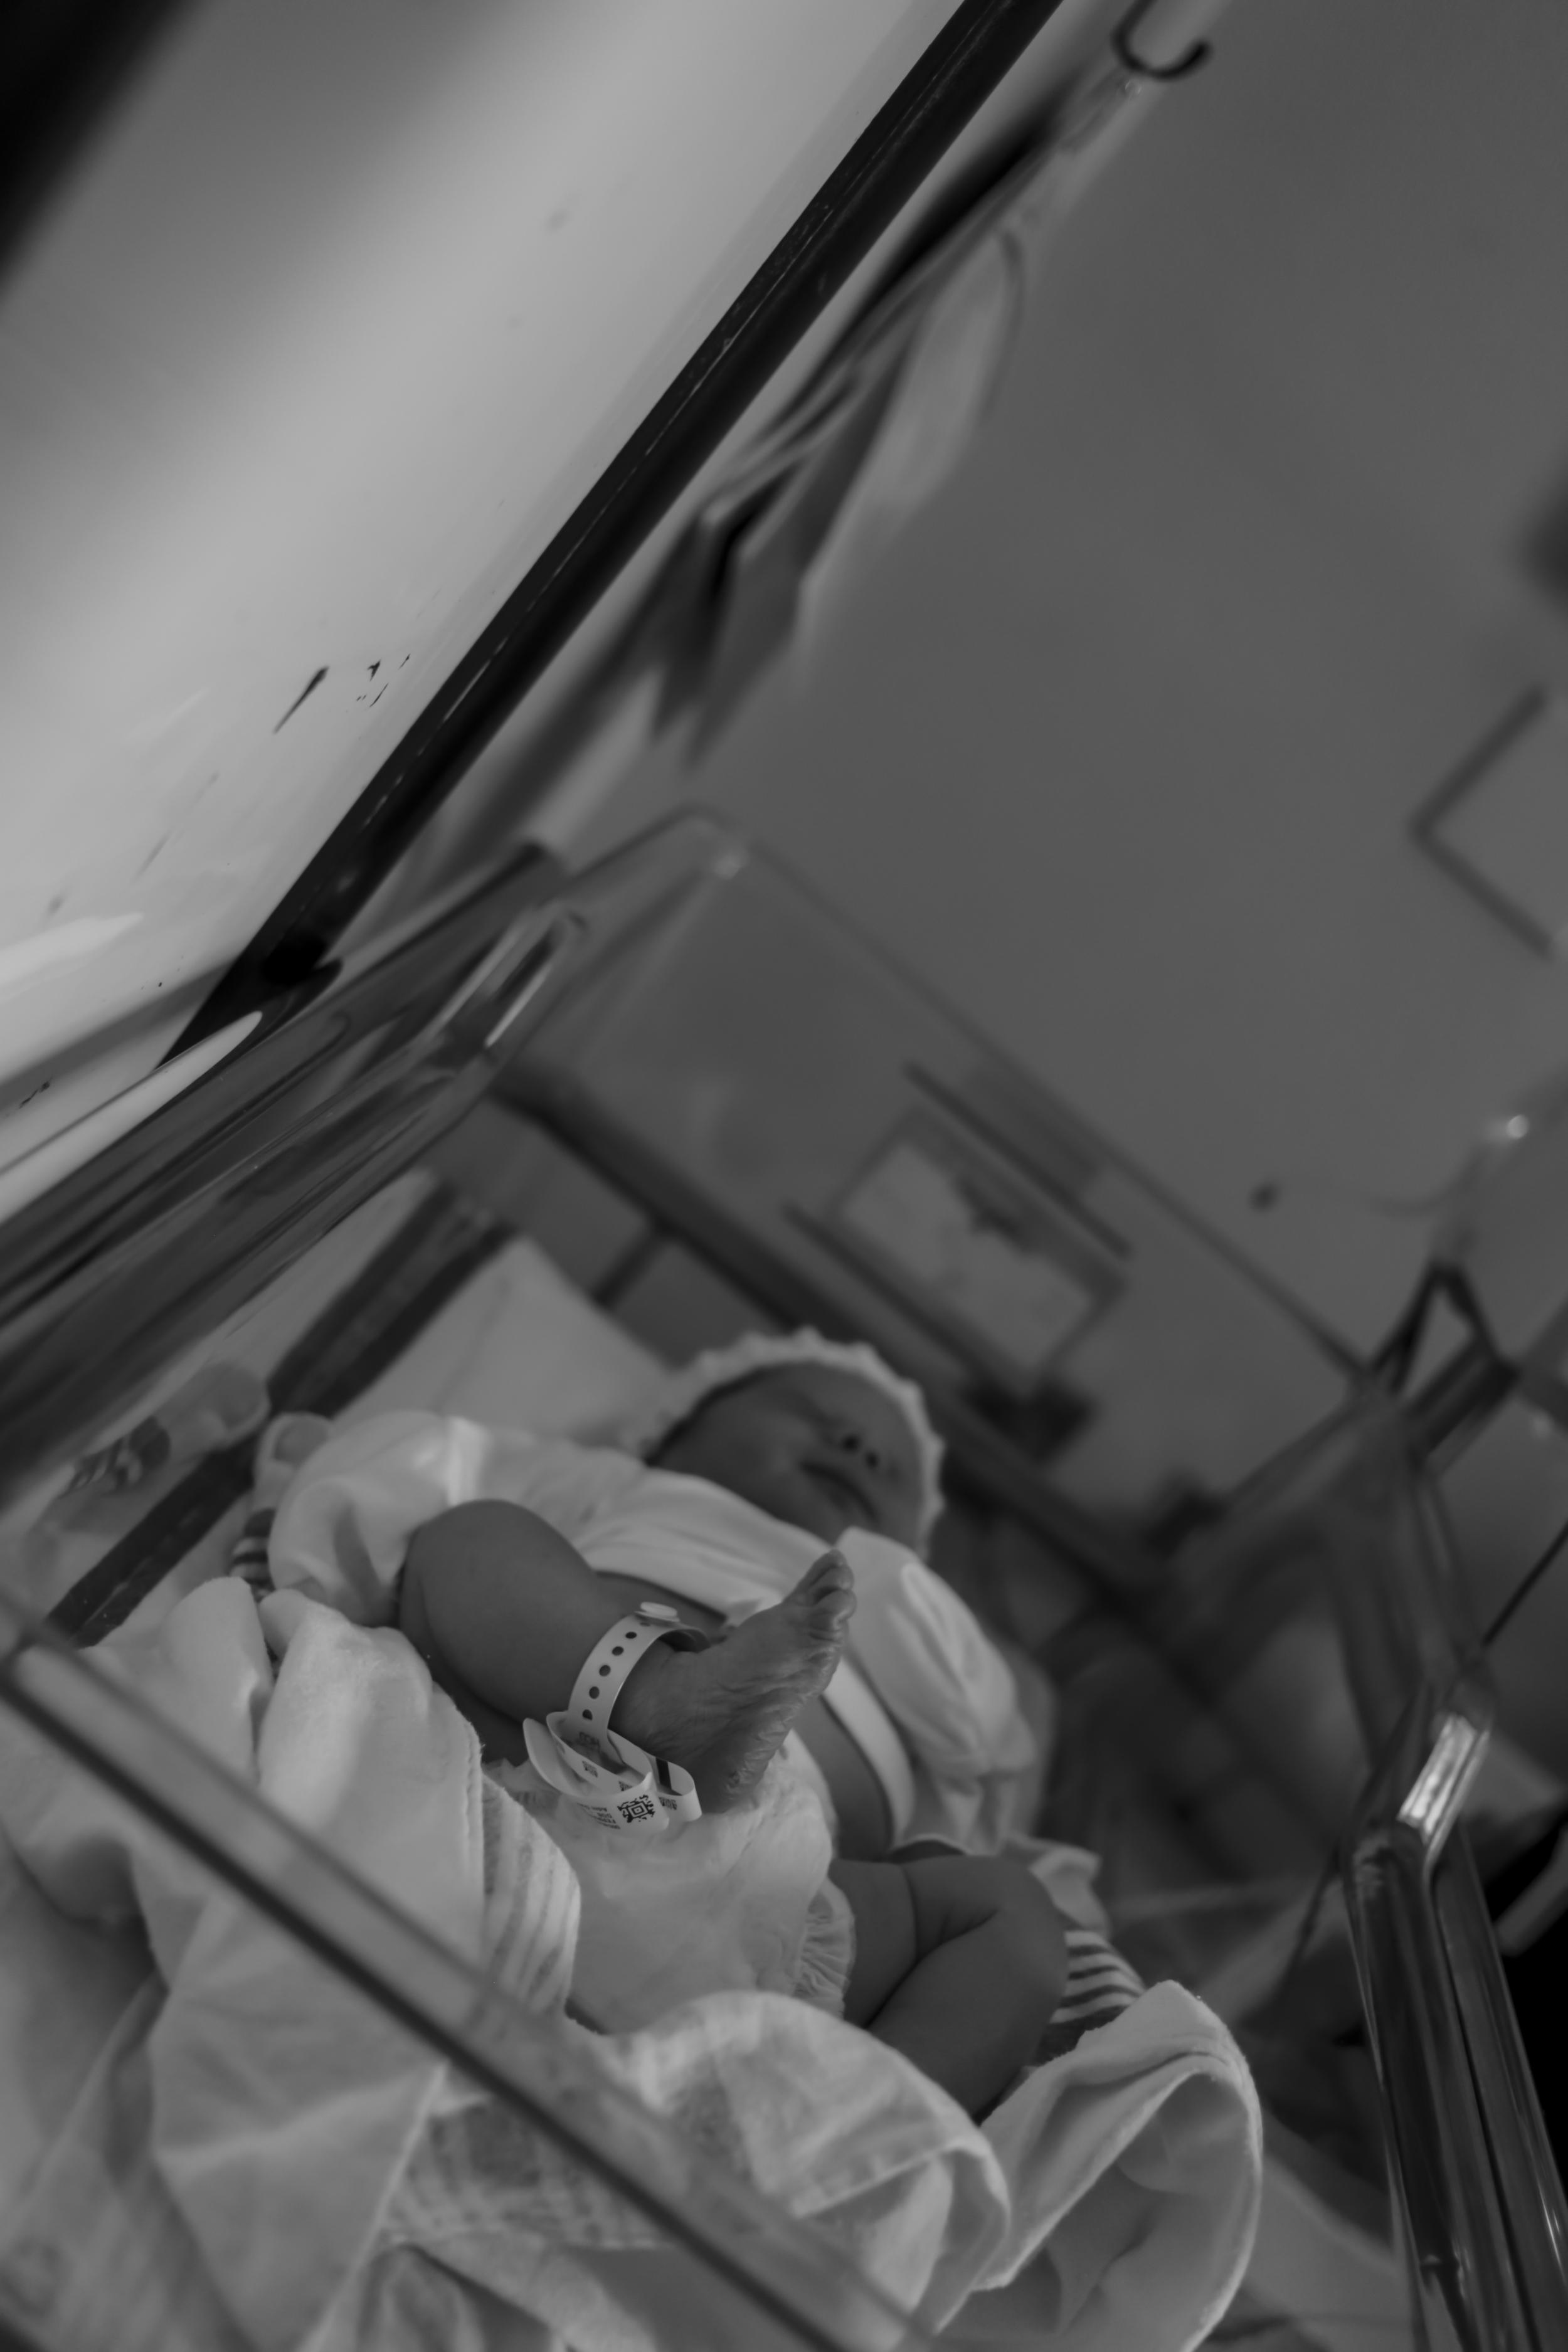 orlando_birth_photographer_winnie_palmer_28.jpg